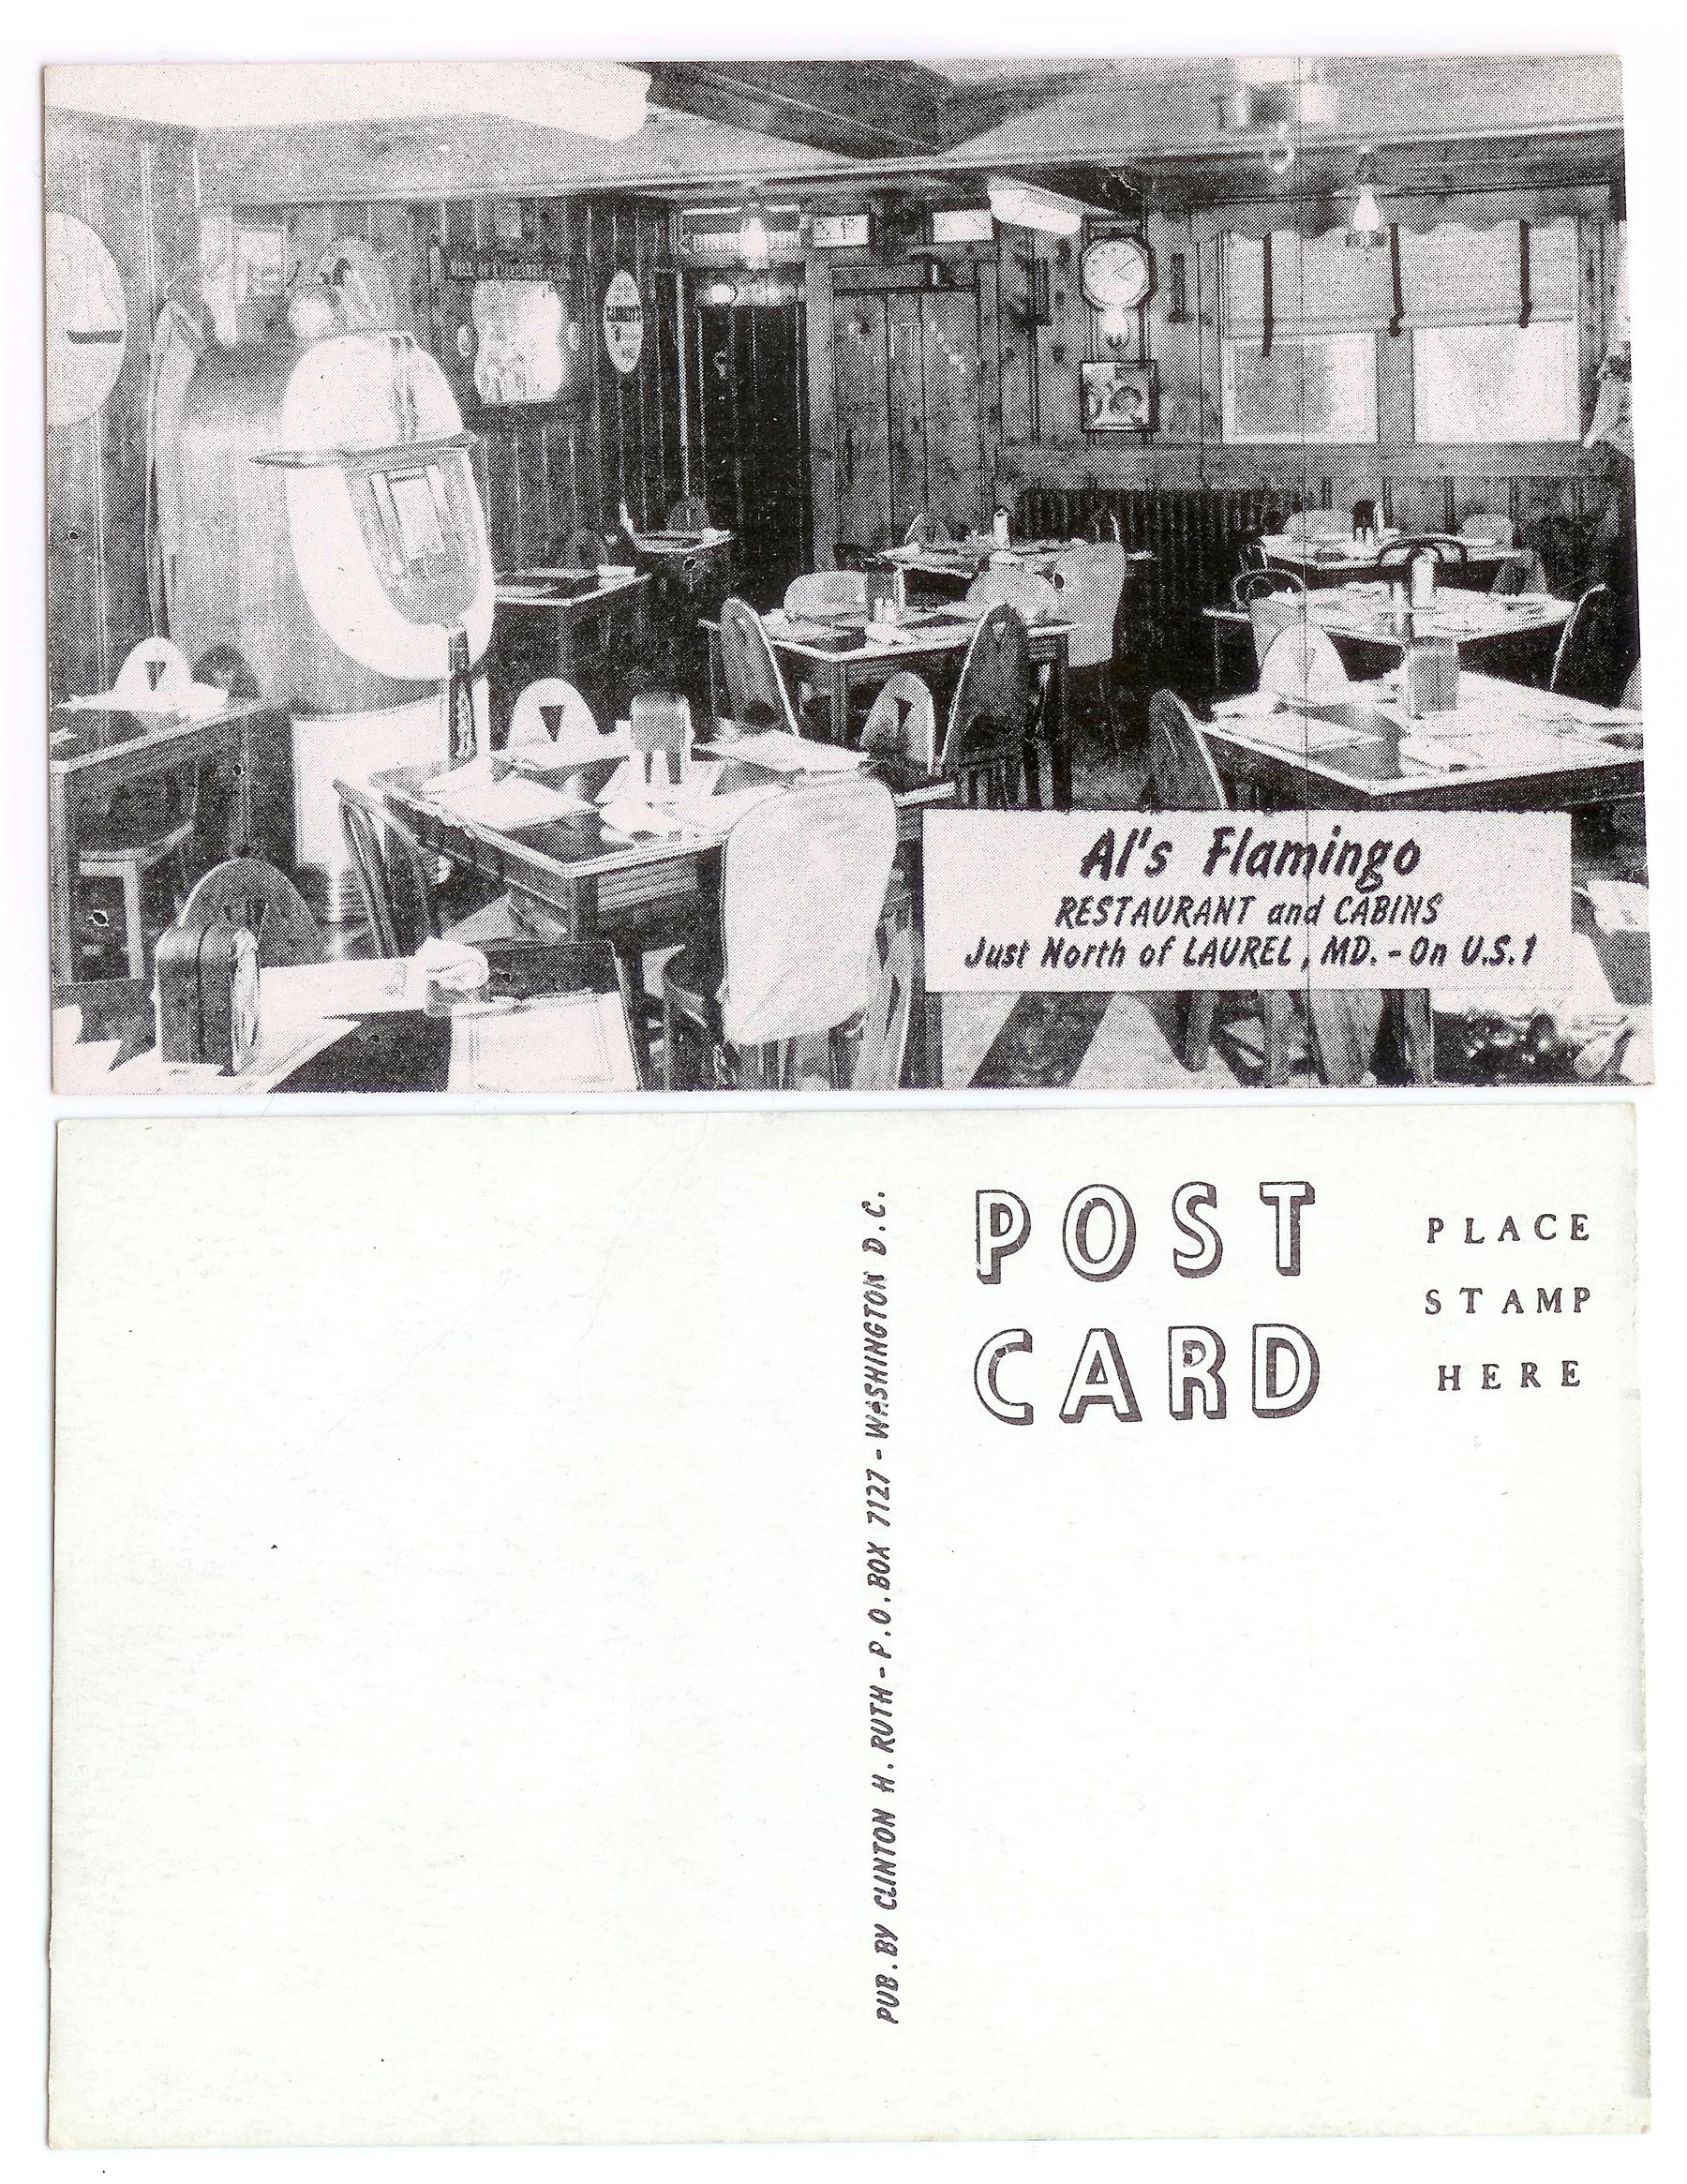 POSTCARDS-4